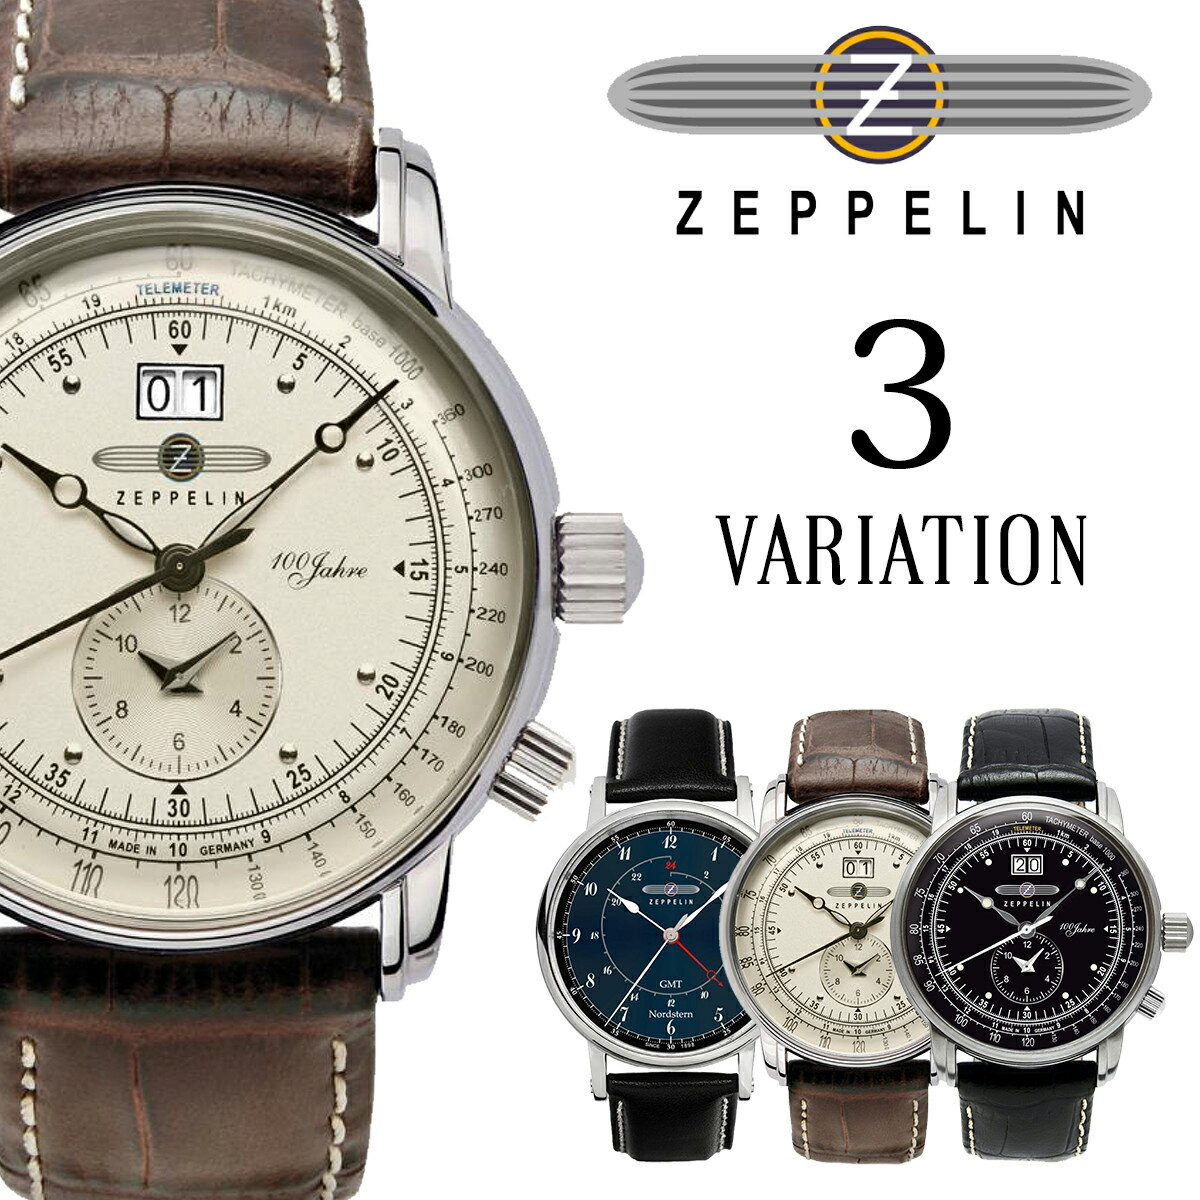 ZEPPELIN ツェッペリン 7640-1 7640-2 7546-3 メンズ 時計 腕時計 プレゼント ギフト 贈り物[あす楽]